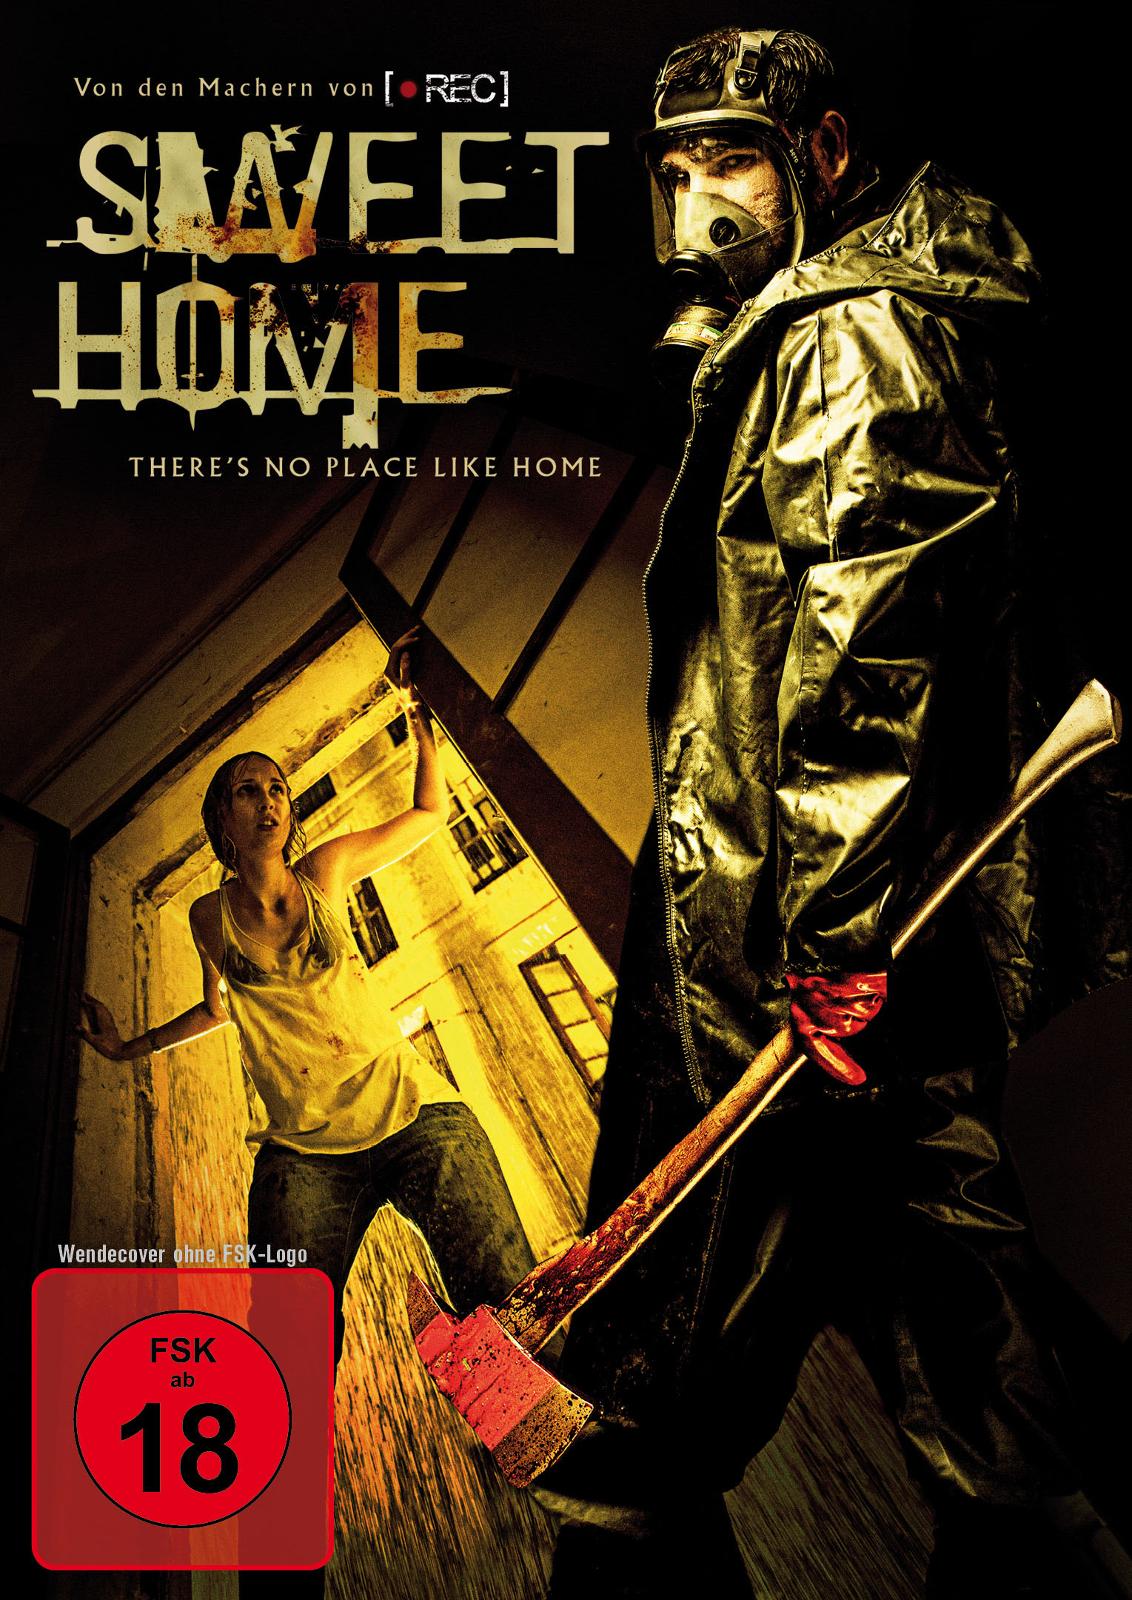 Sweet Home - Film 2015 - FILMSTARTS.de